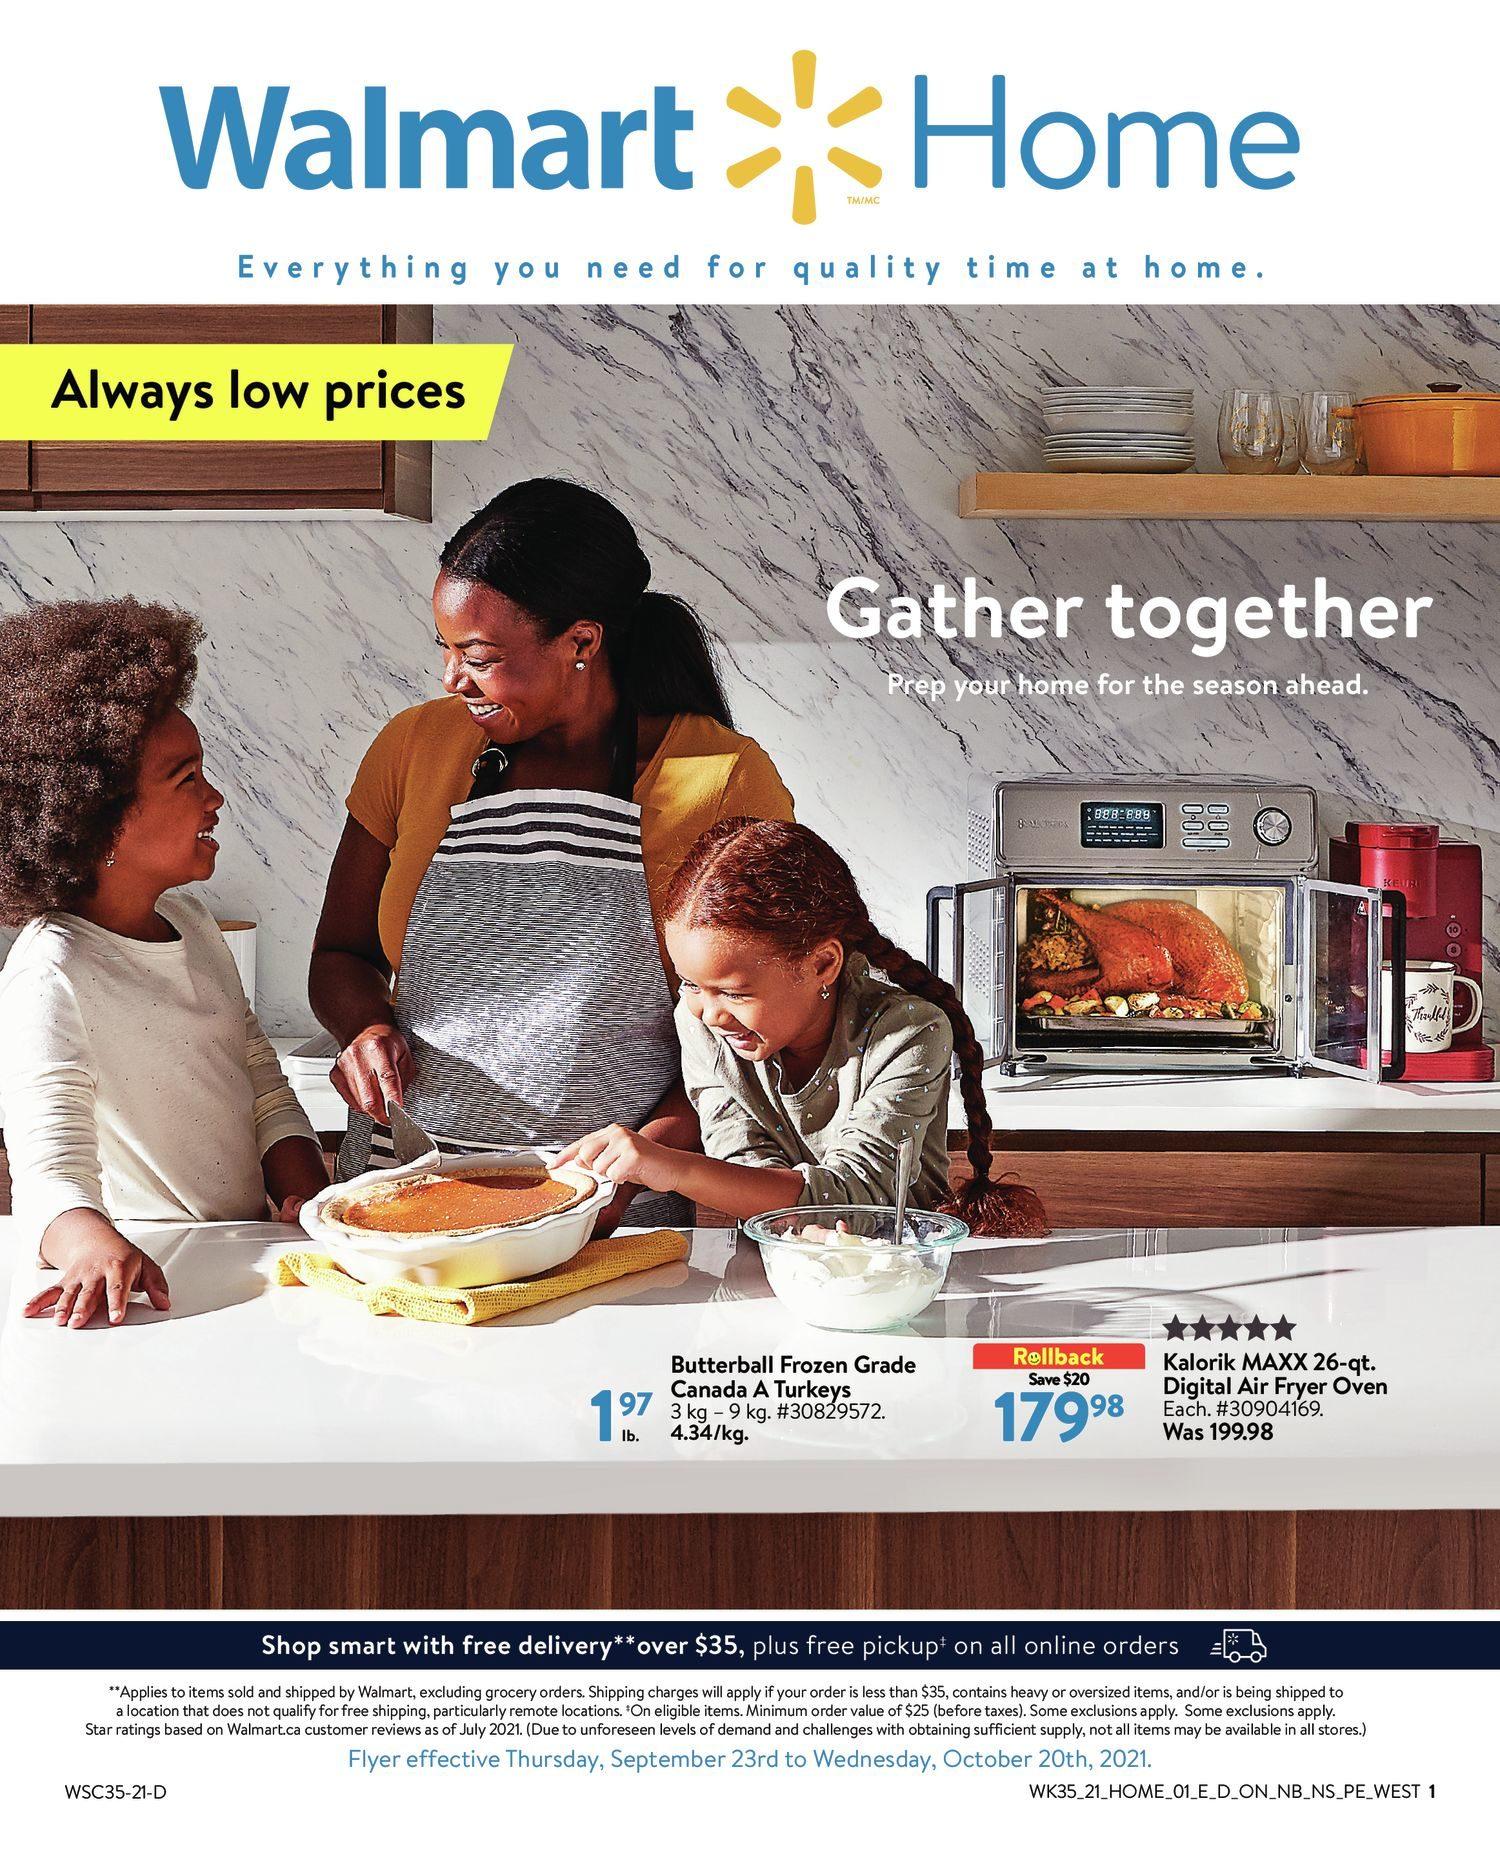 Walmart - Home Book